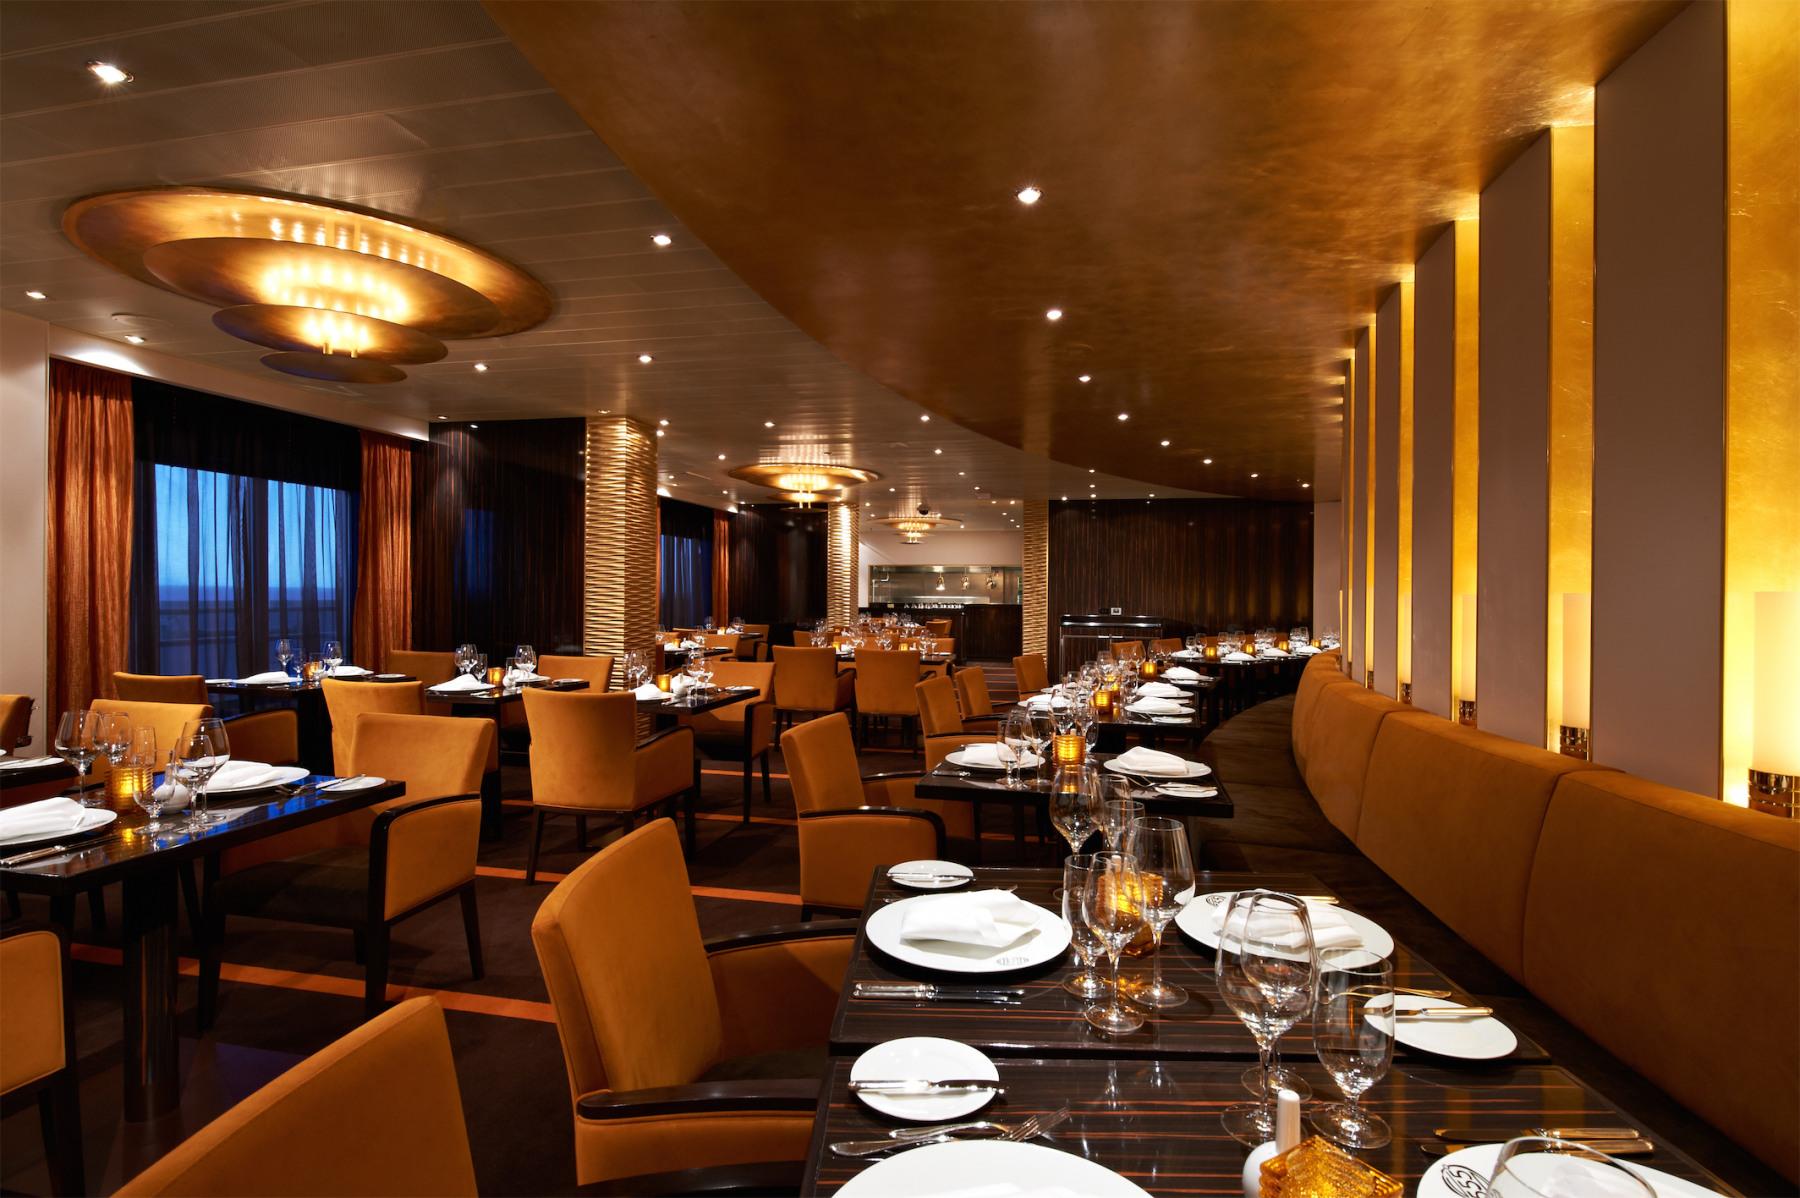 Carnival Cruise Lines Carnival Breeze Fahrenheit 555 Steakhouse 1.jpg